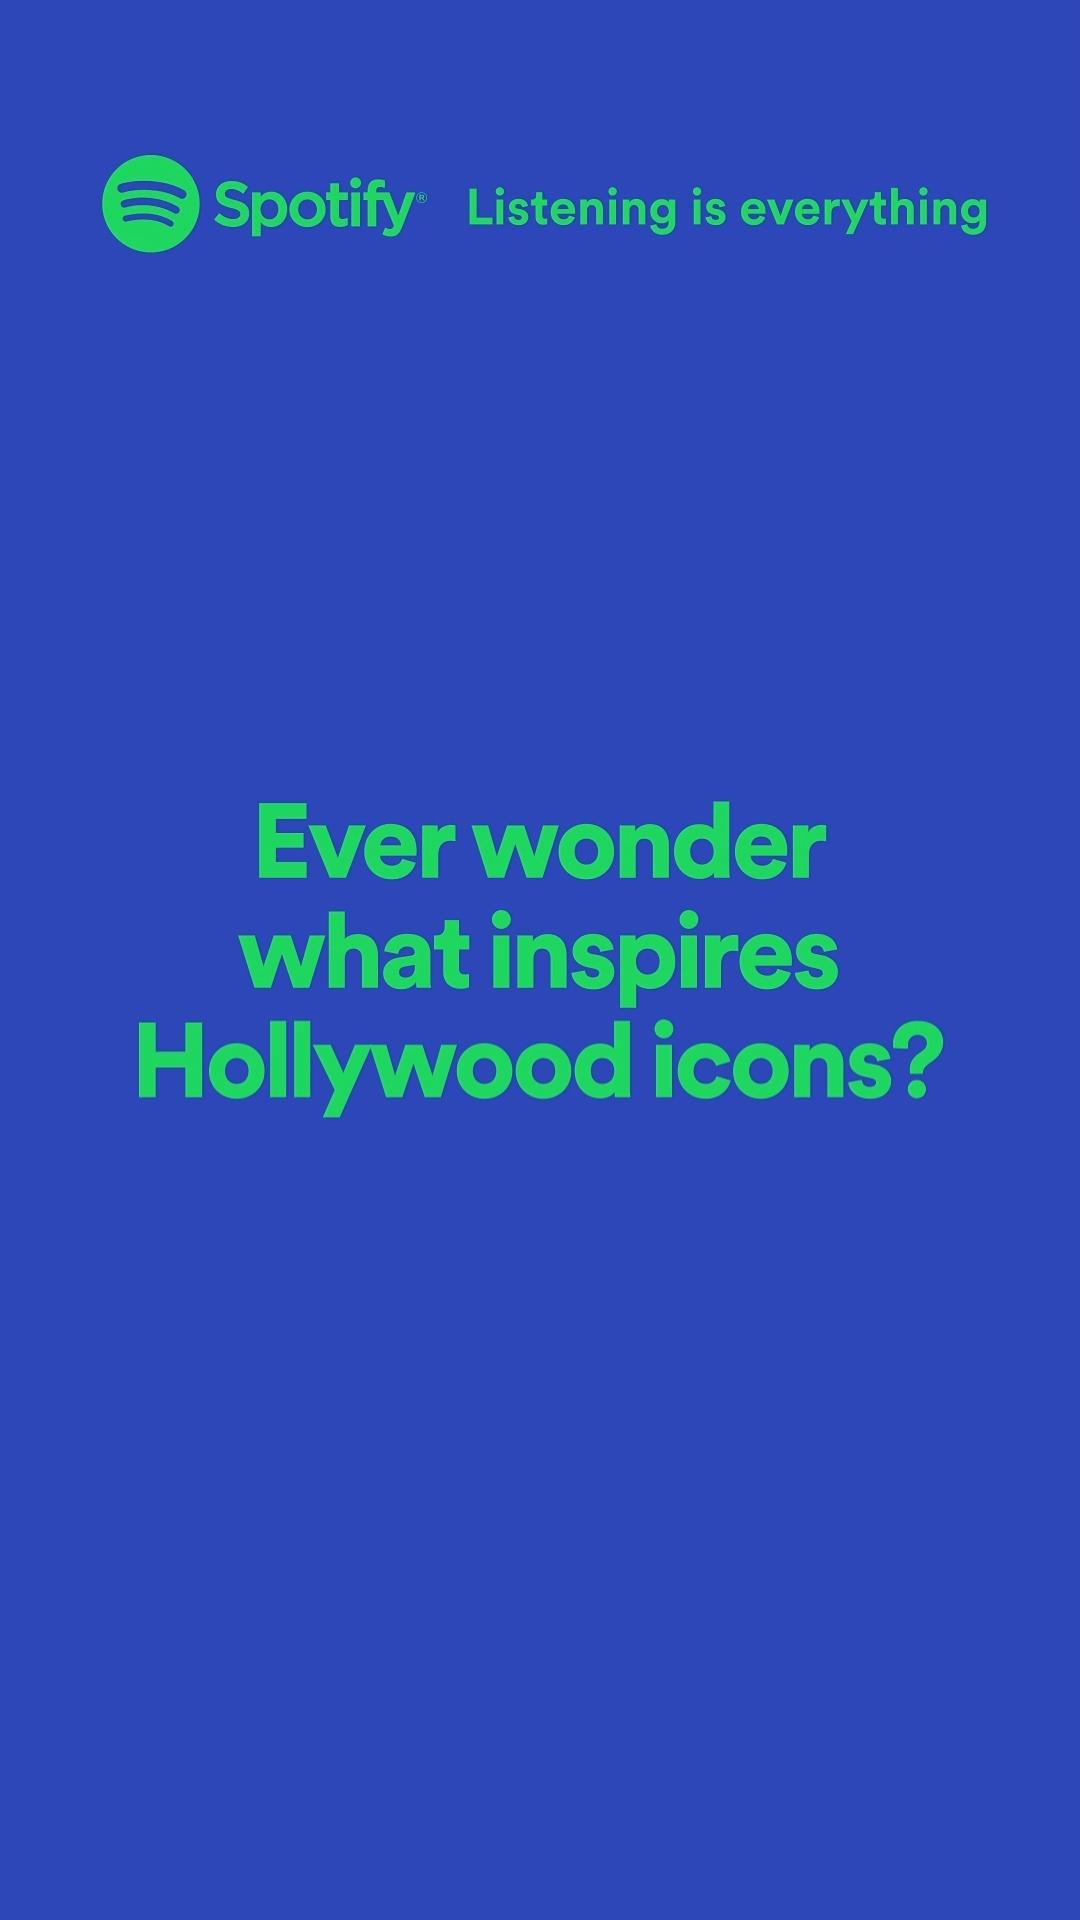 Gershoni CS Spotify Soul Social Ad Hollywood Icons 1080x1350 Video Poster 030421